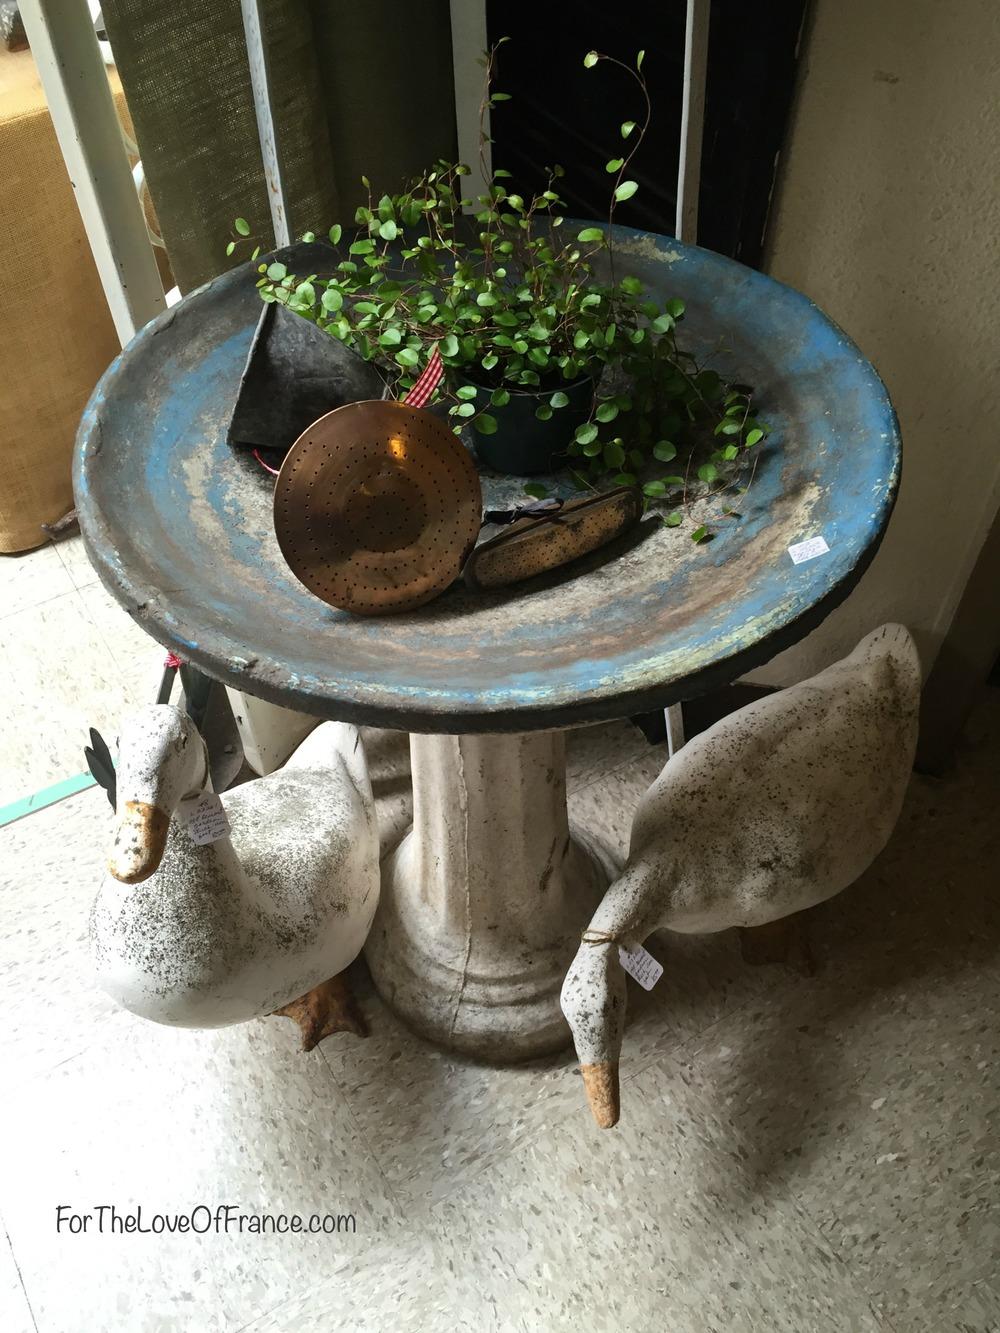 Vintage birdbath and garden statues.jpg